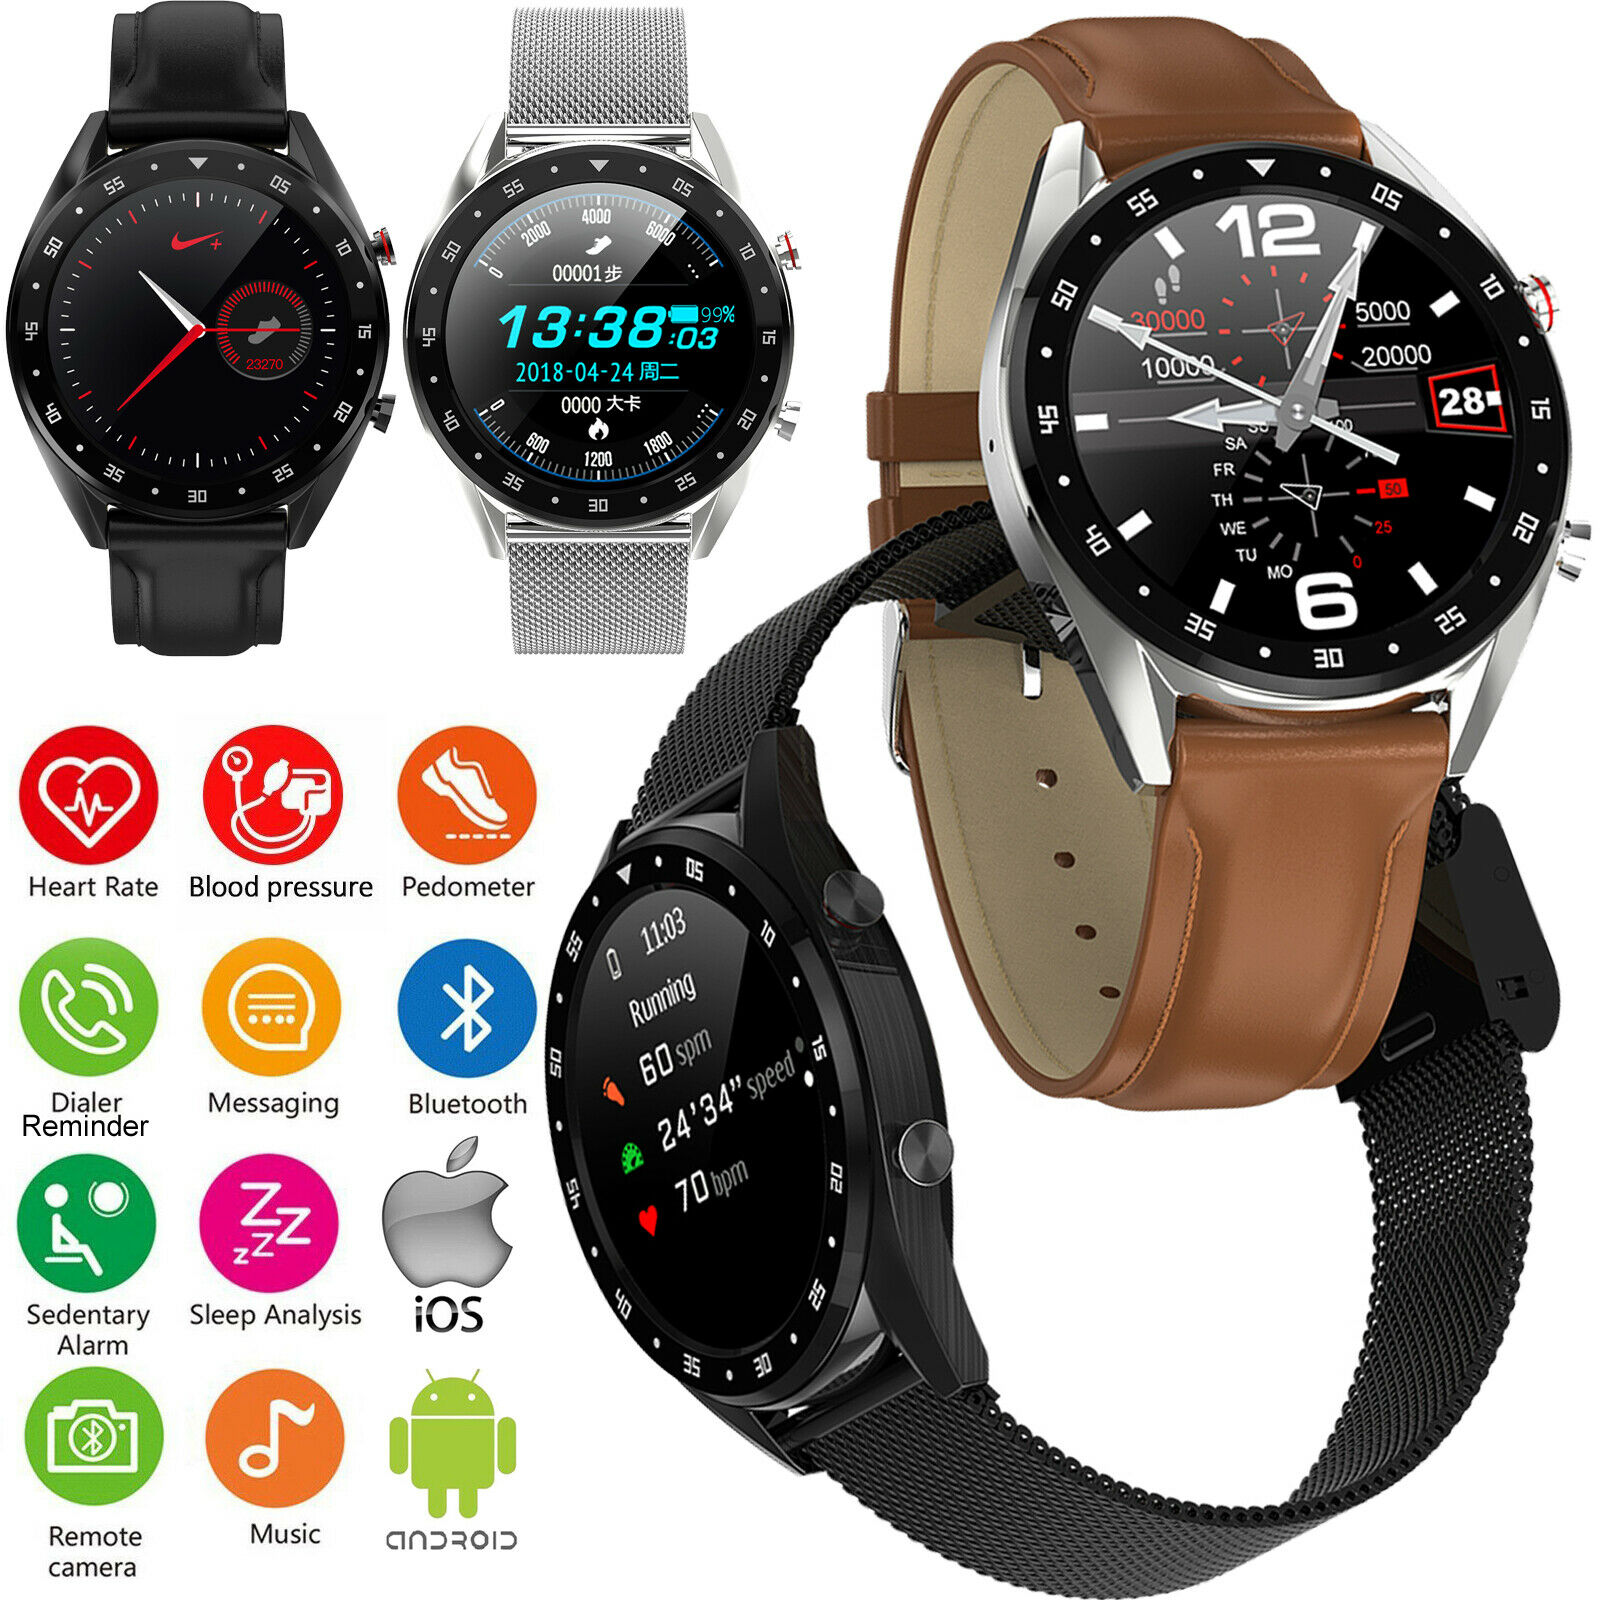 Smart Watch Bluetooth Phone Heart Rate ECG Tracker for iPhone Samsung Moto LG bluetooth ecg for heart iphone phone rate smart tracker watch